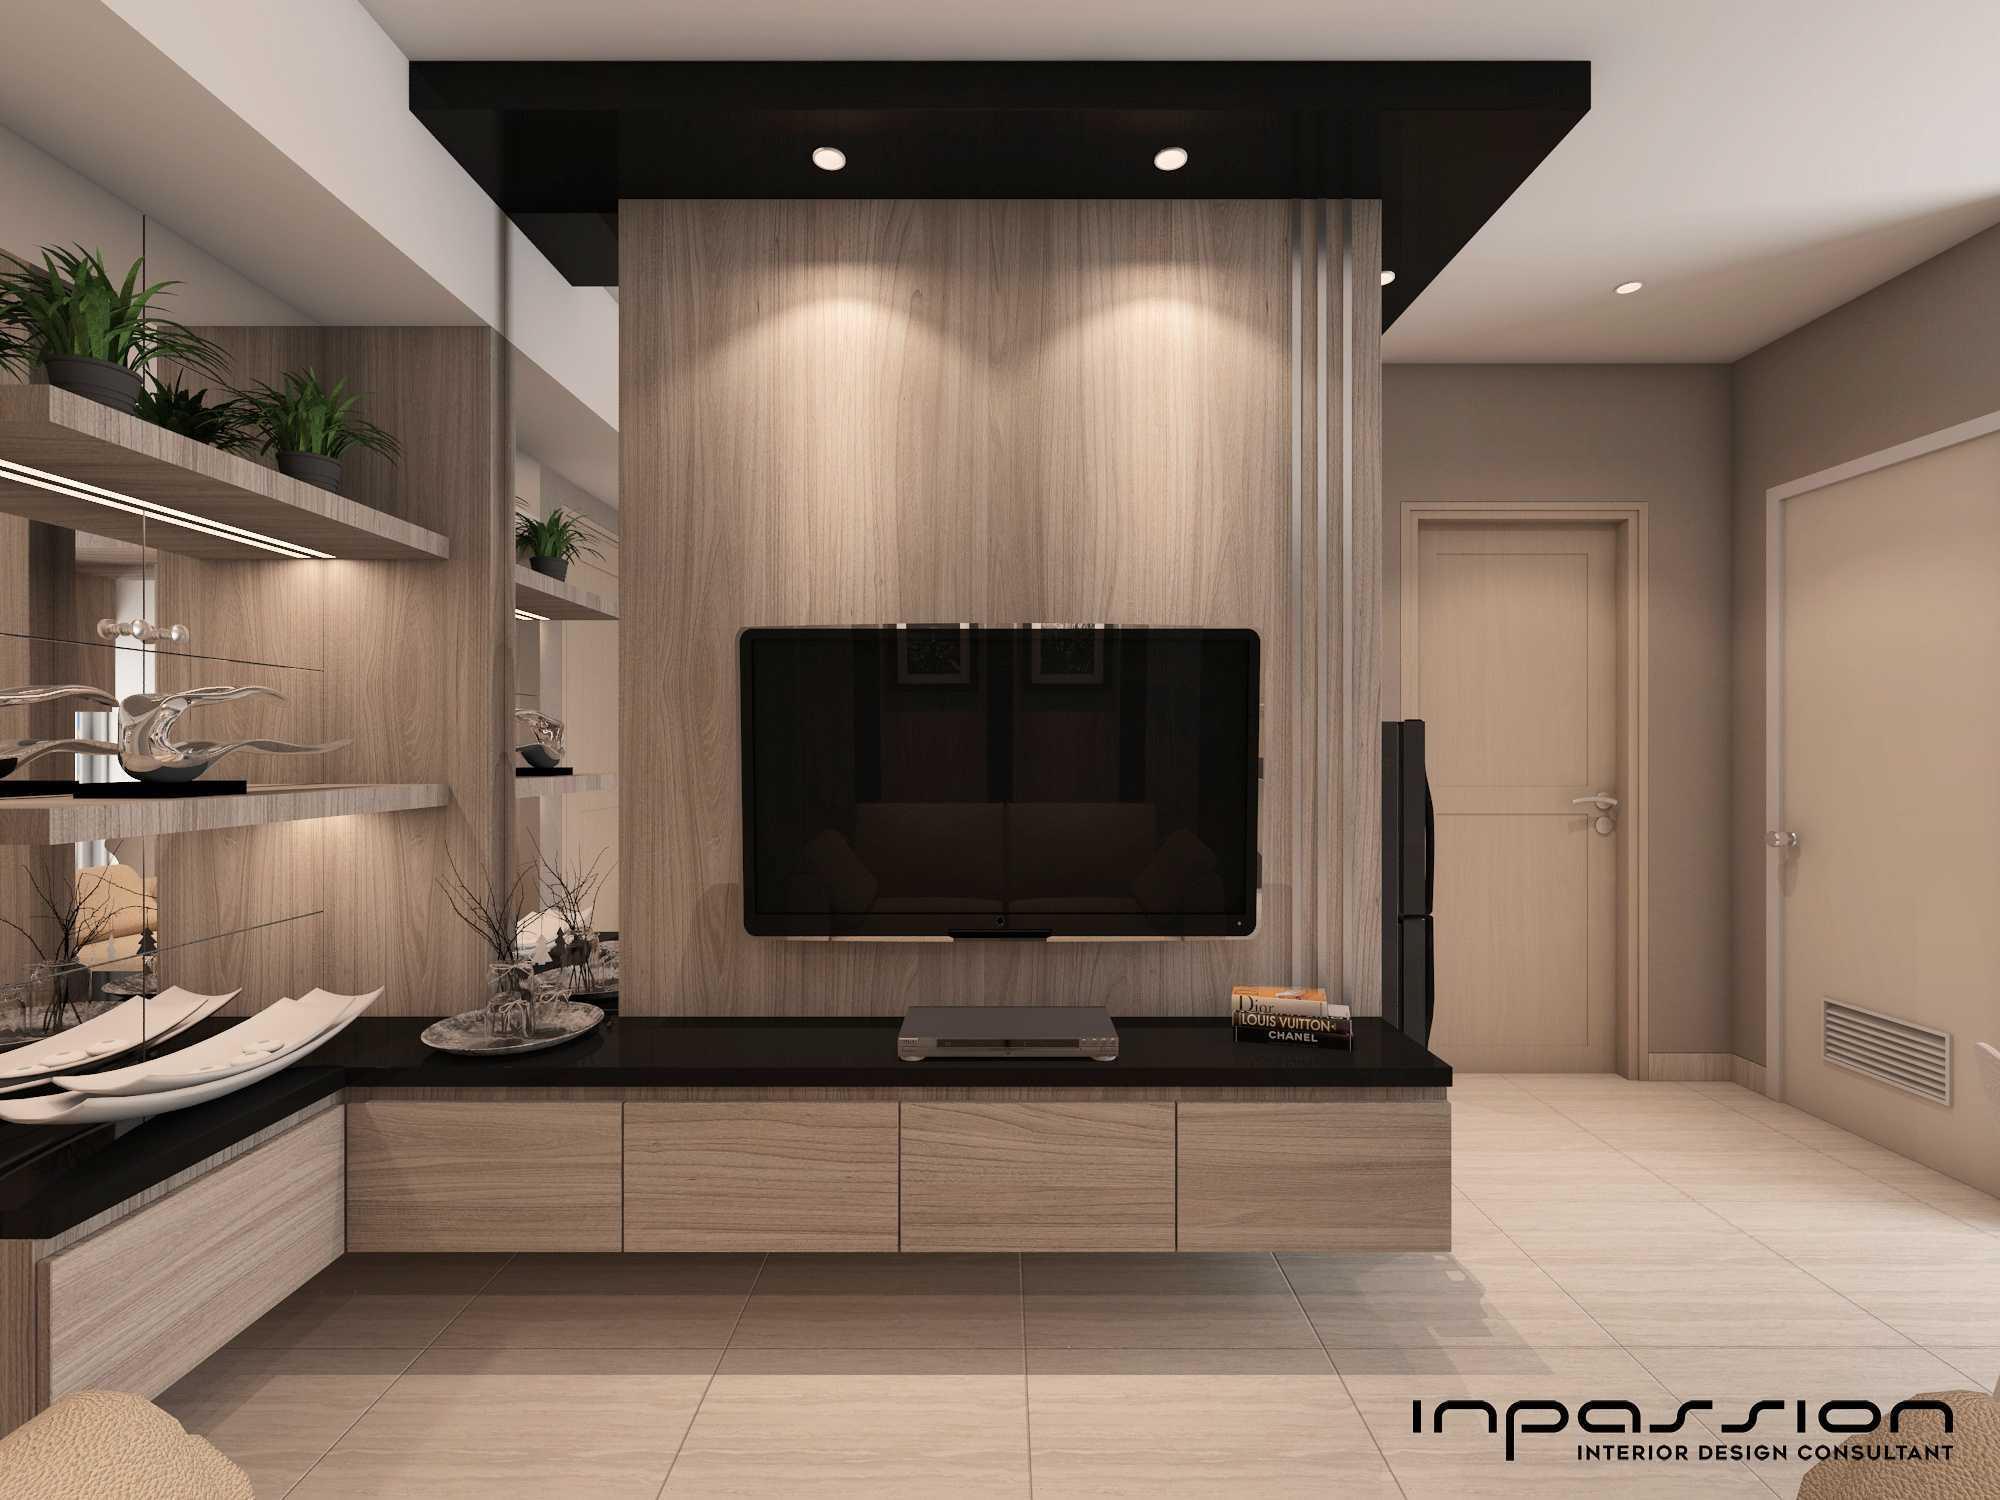 Inpassion Interior Design Educity Apartemen 3 Bedroom Surabaya City, East Java, Indonesia Surabaya City, East Java, Indonesia Img20170429114502971 Kontemporer  31360